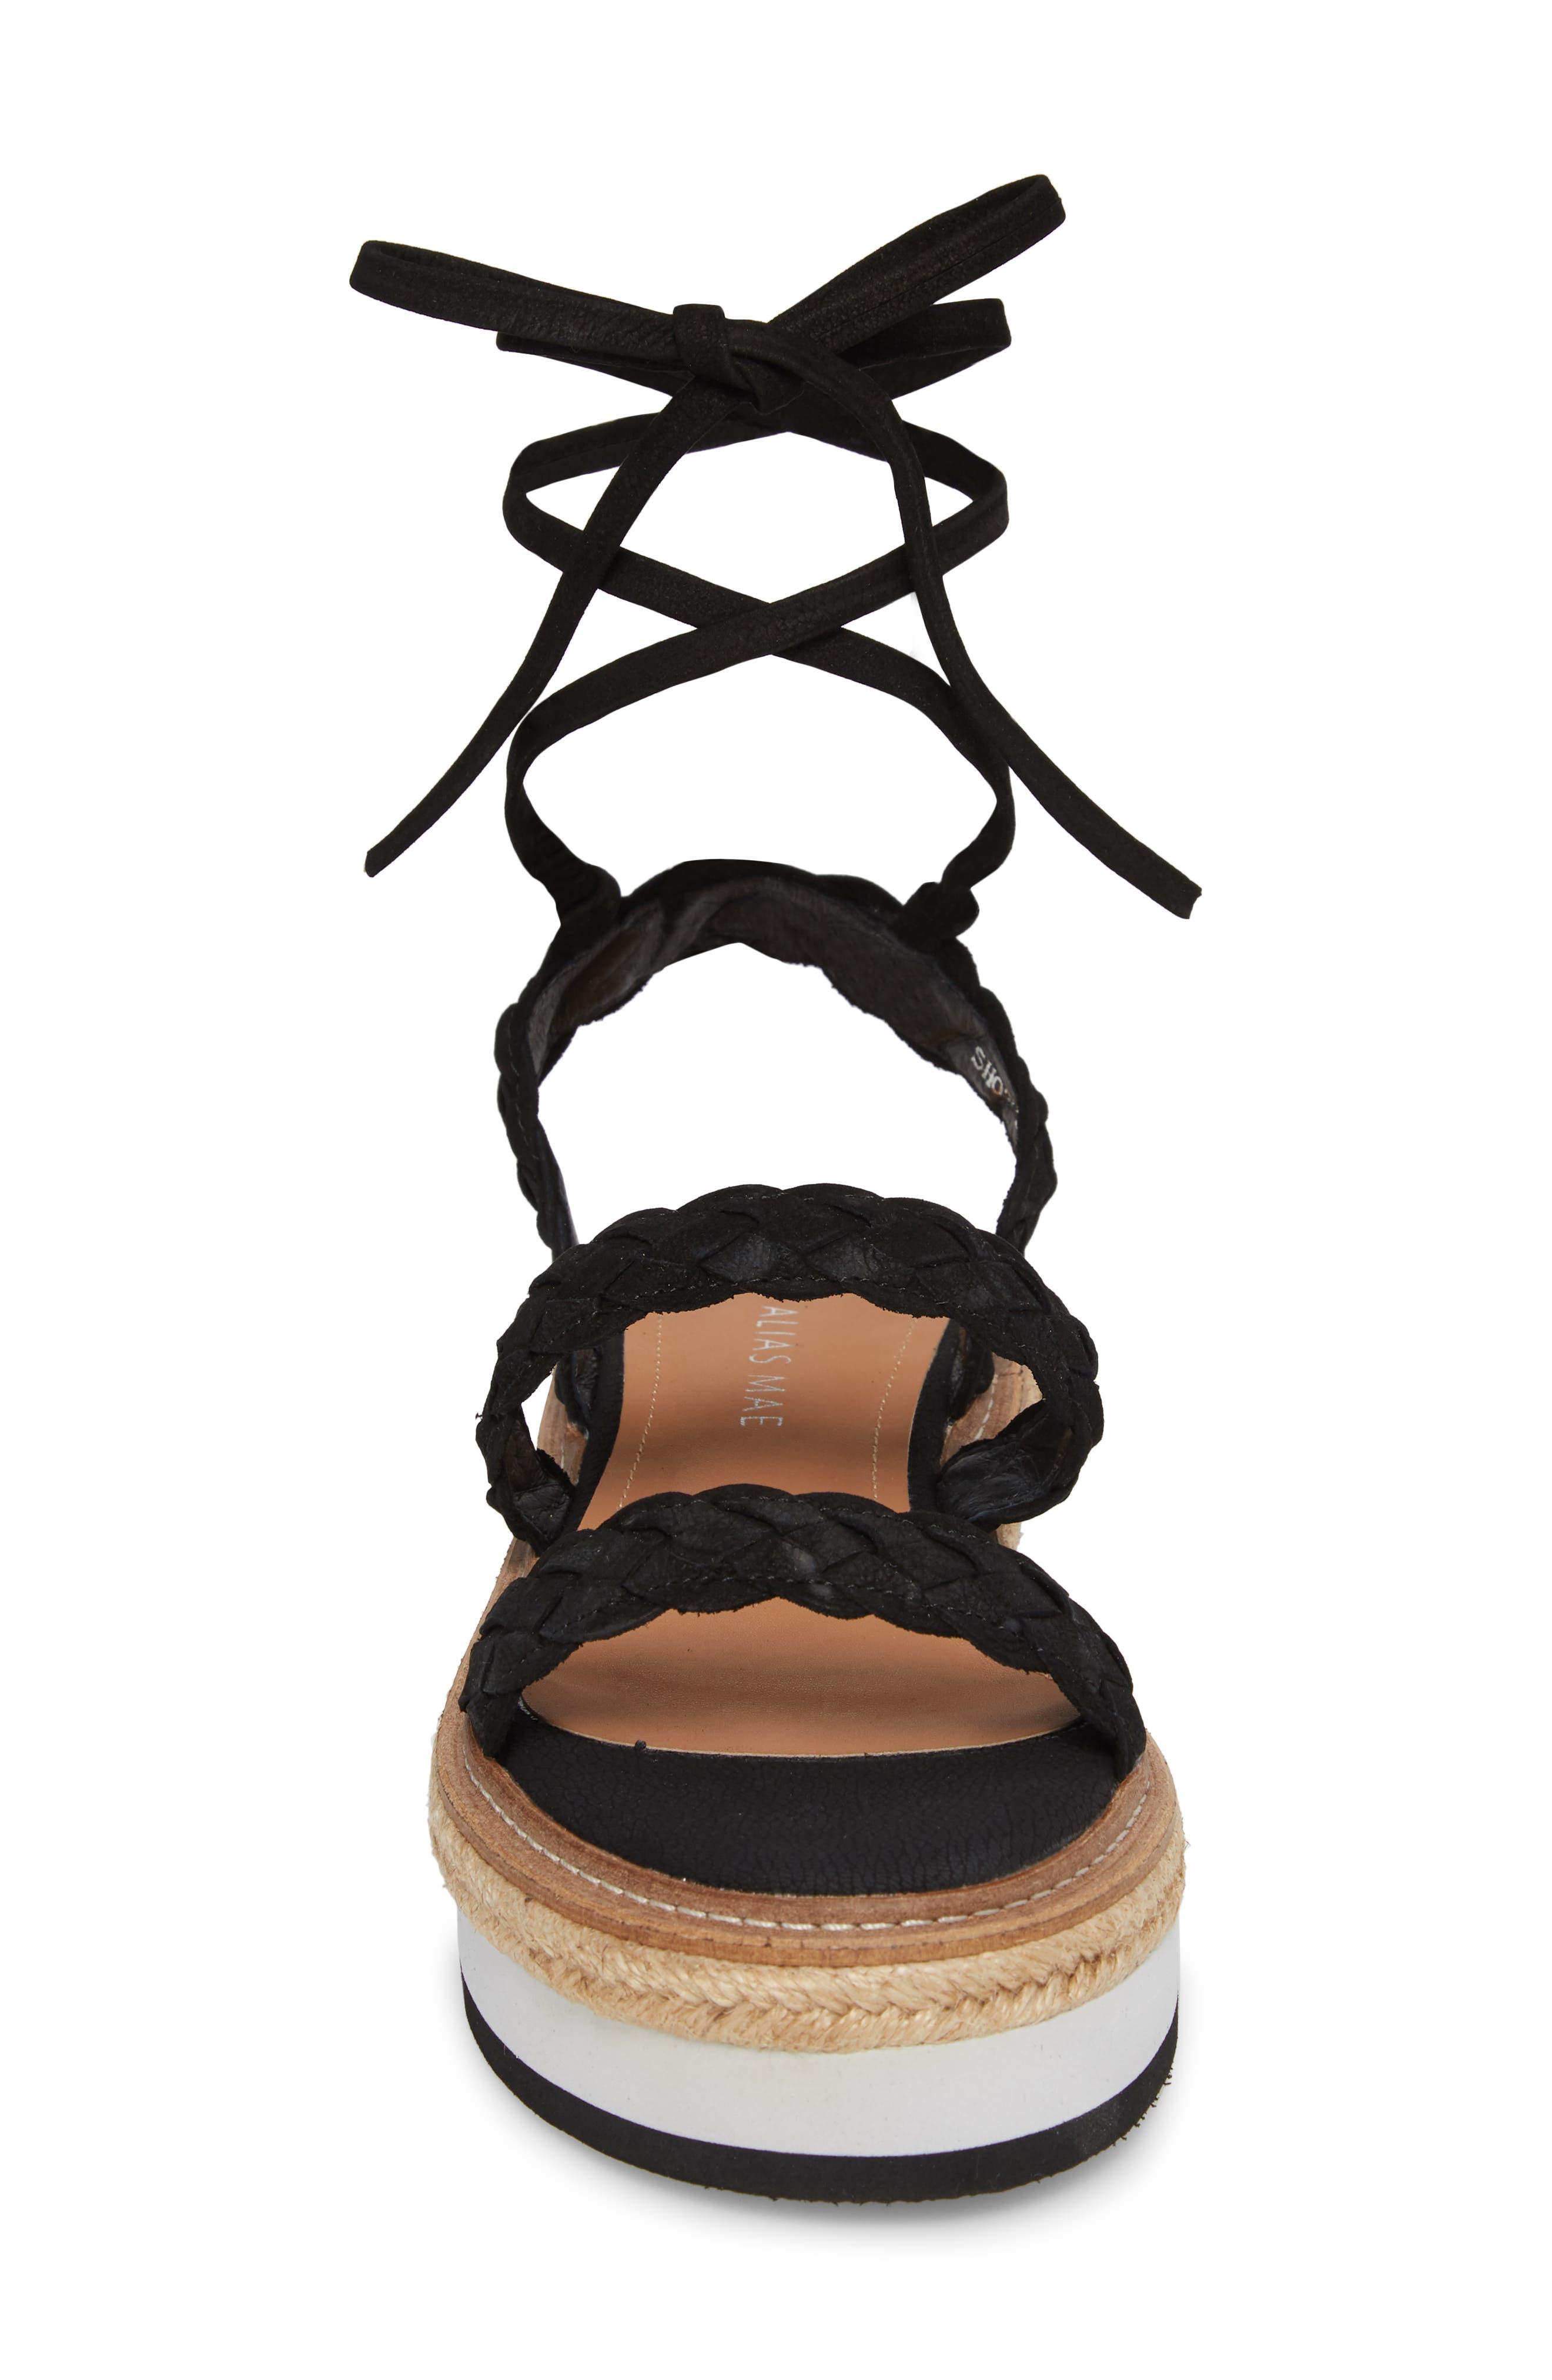 Nieve Braided Platform Sandal,                             Alternate thumbnail 4, color,                             001